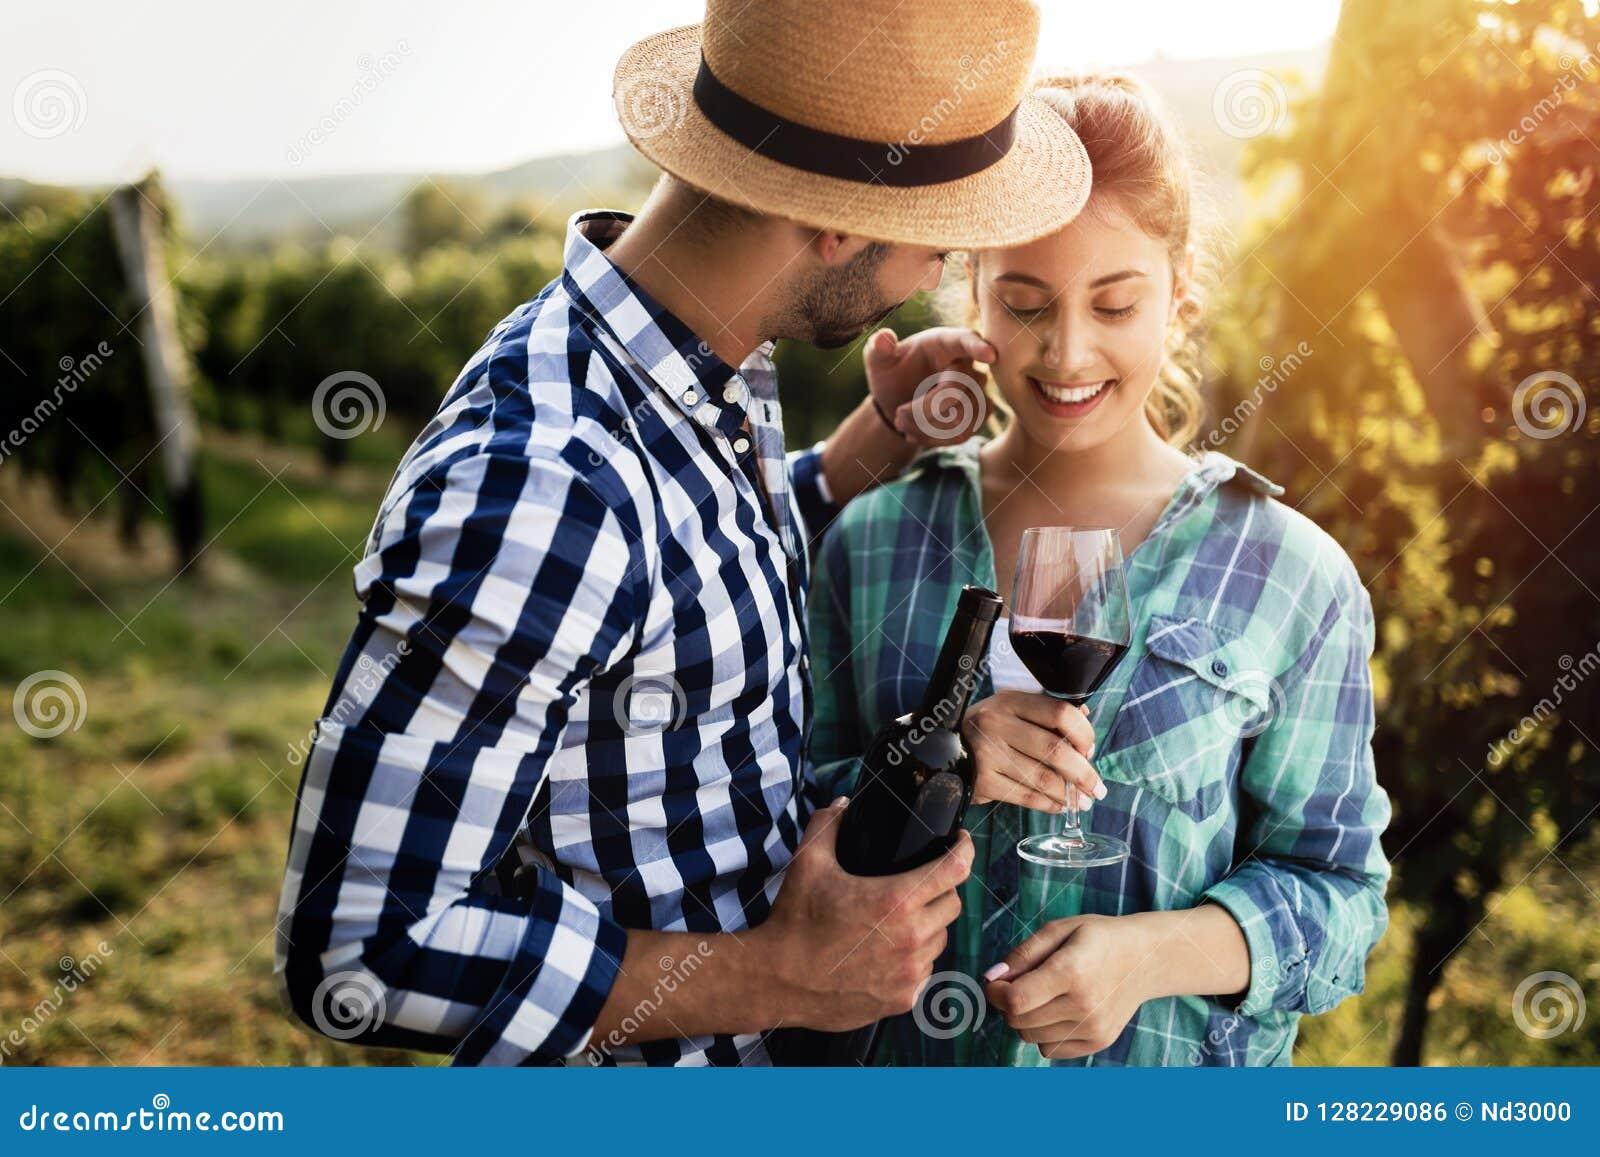 Grapevine dating buddista dating UK